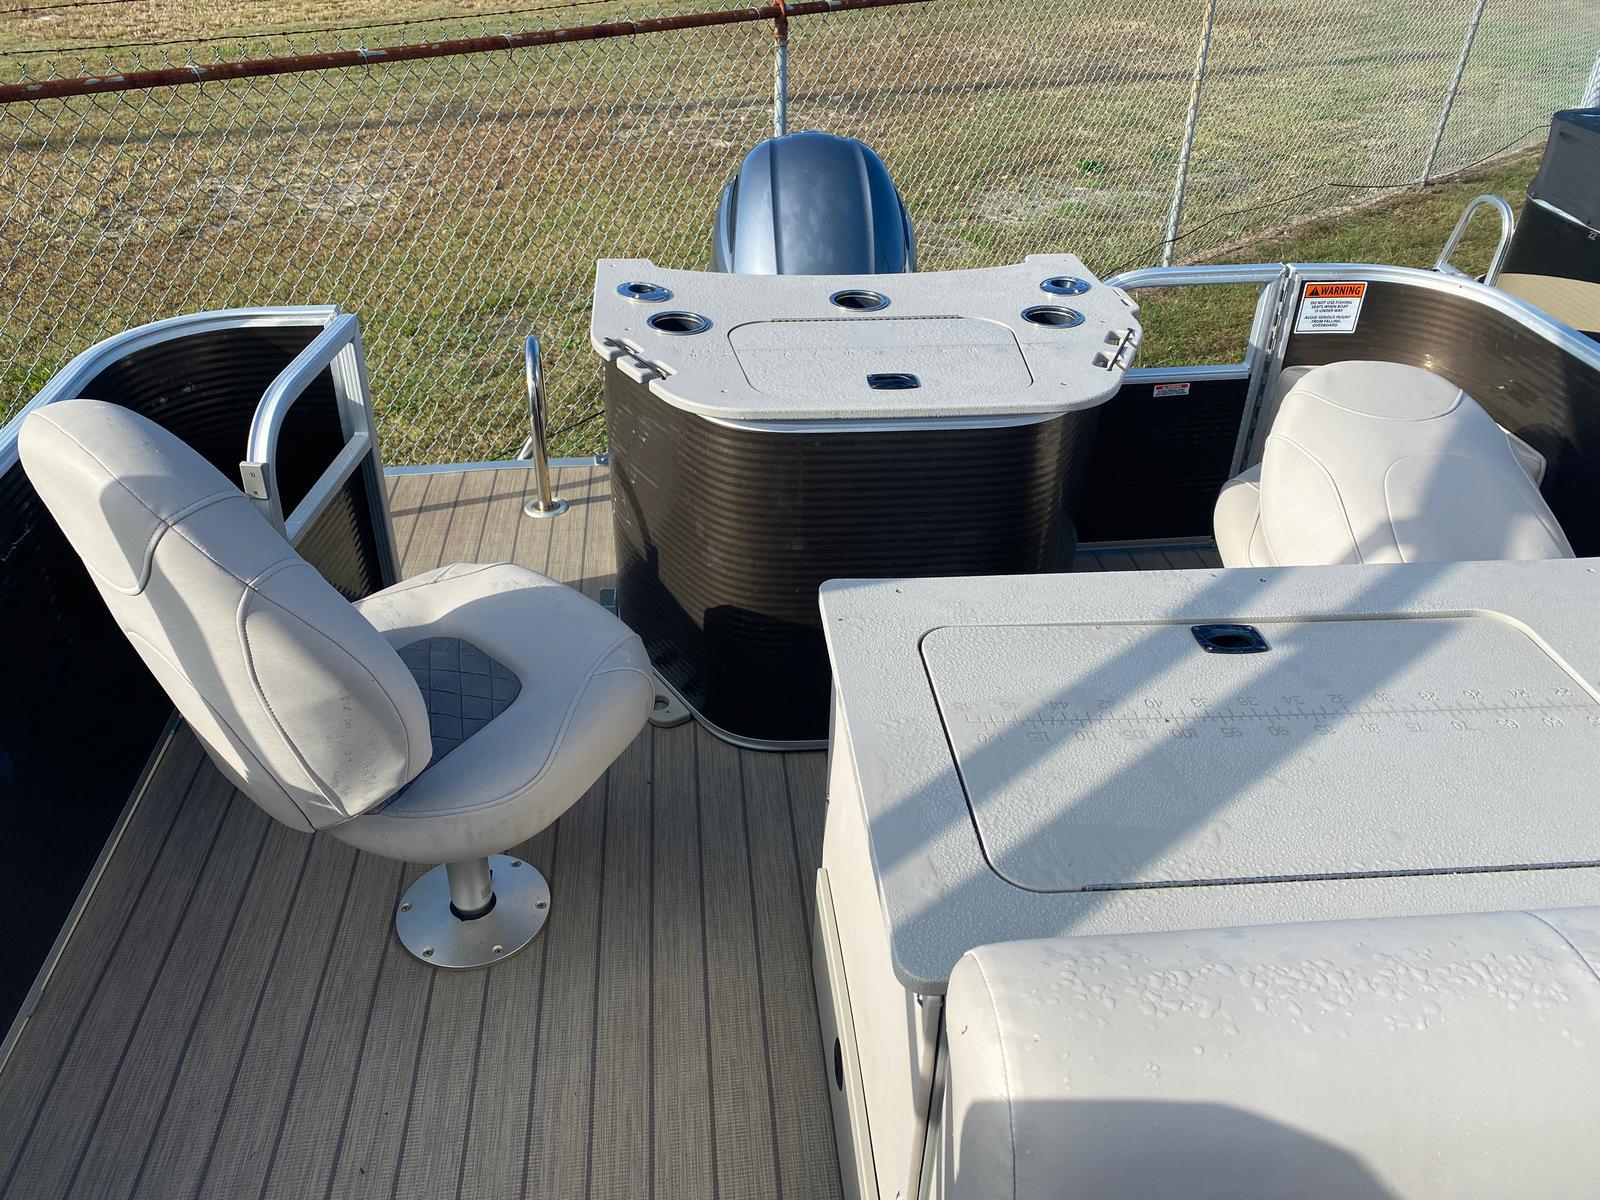 2018 Bennington boat for sale, model of the boat is 22 SSX Pontoon & Image # 12 of 13